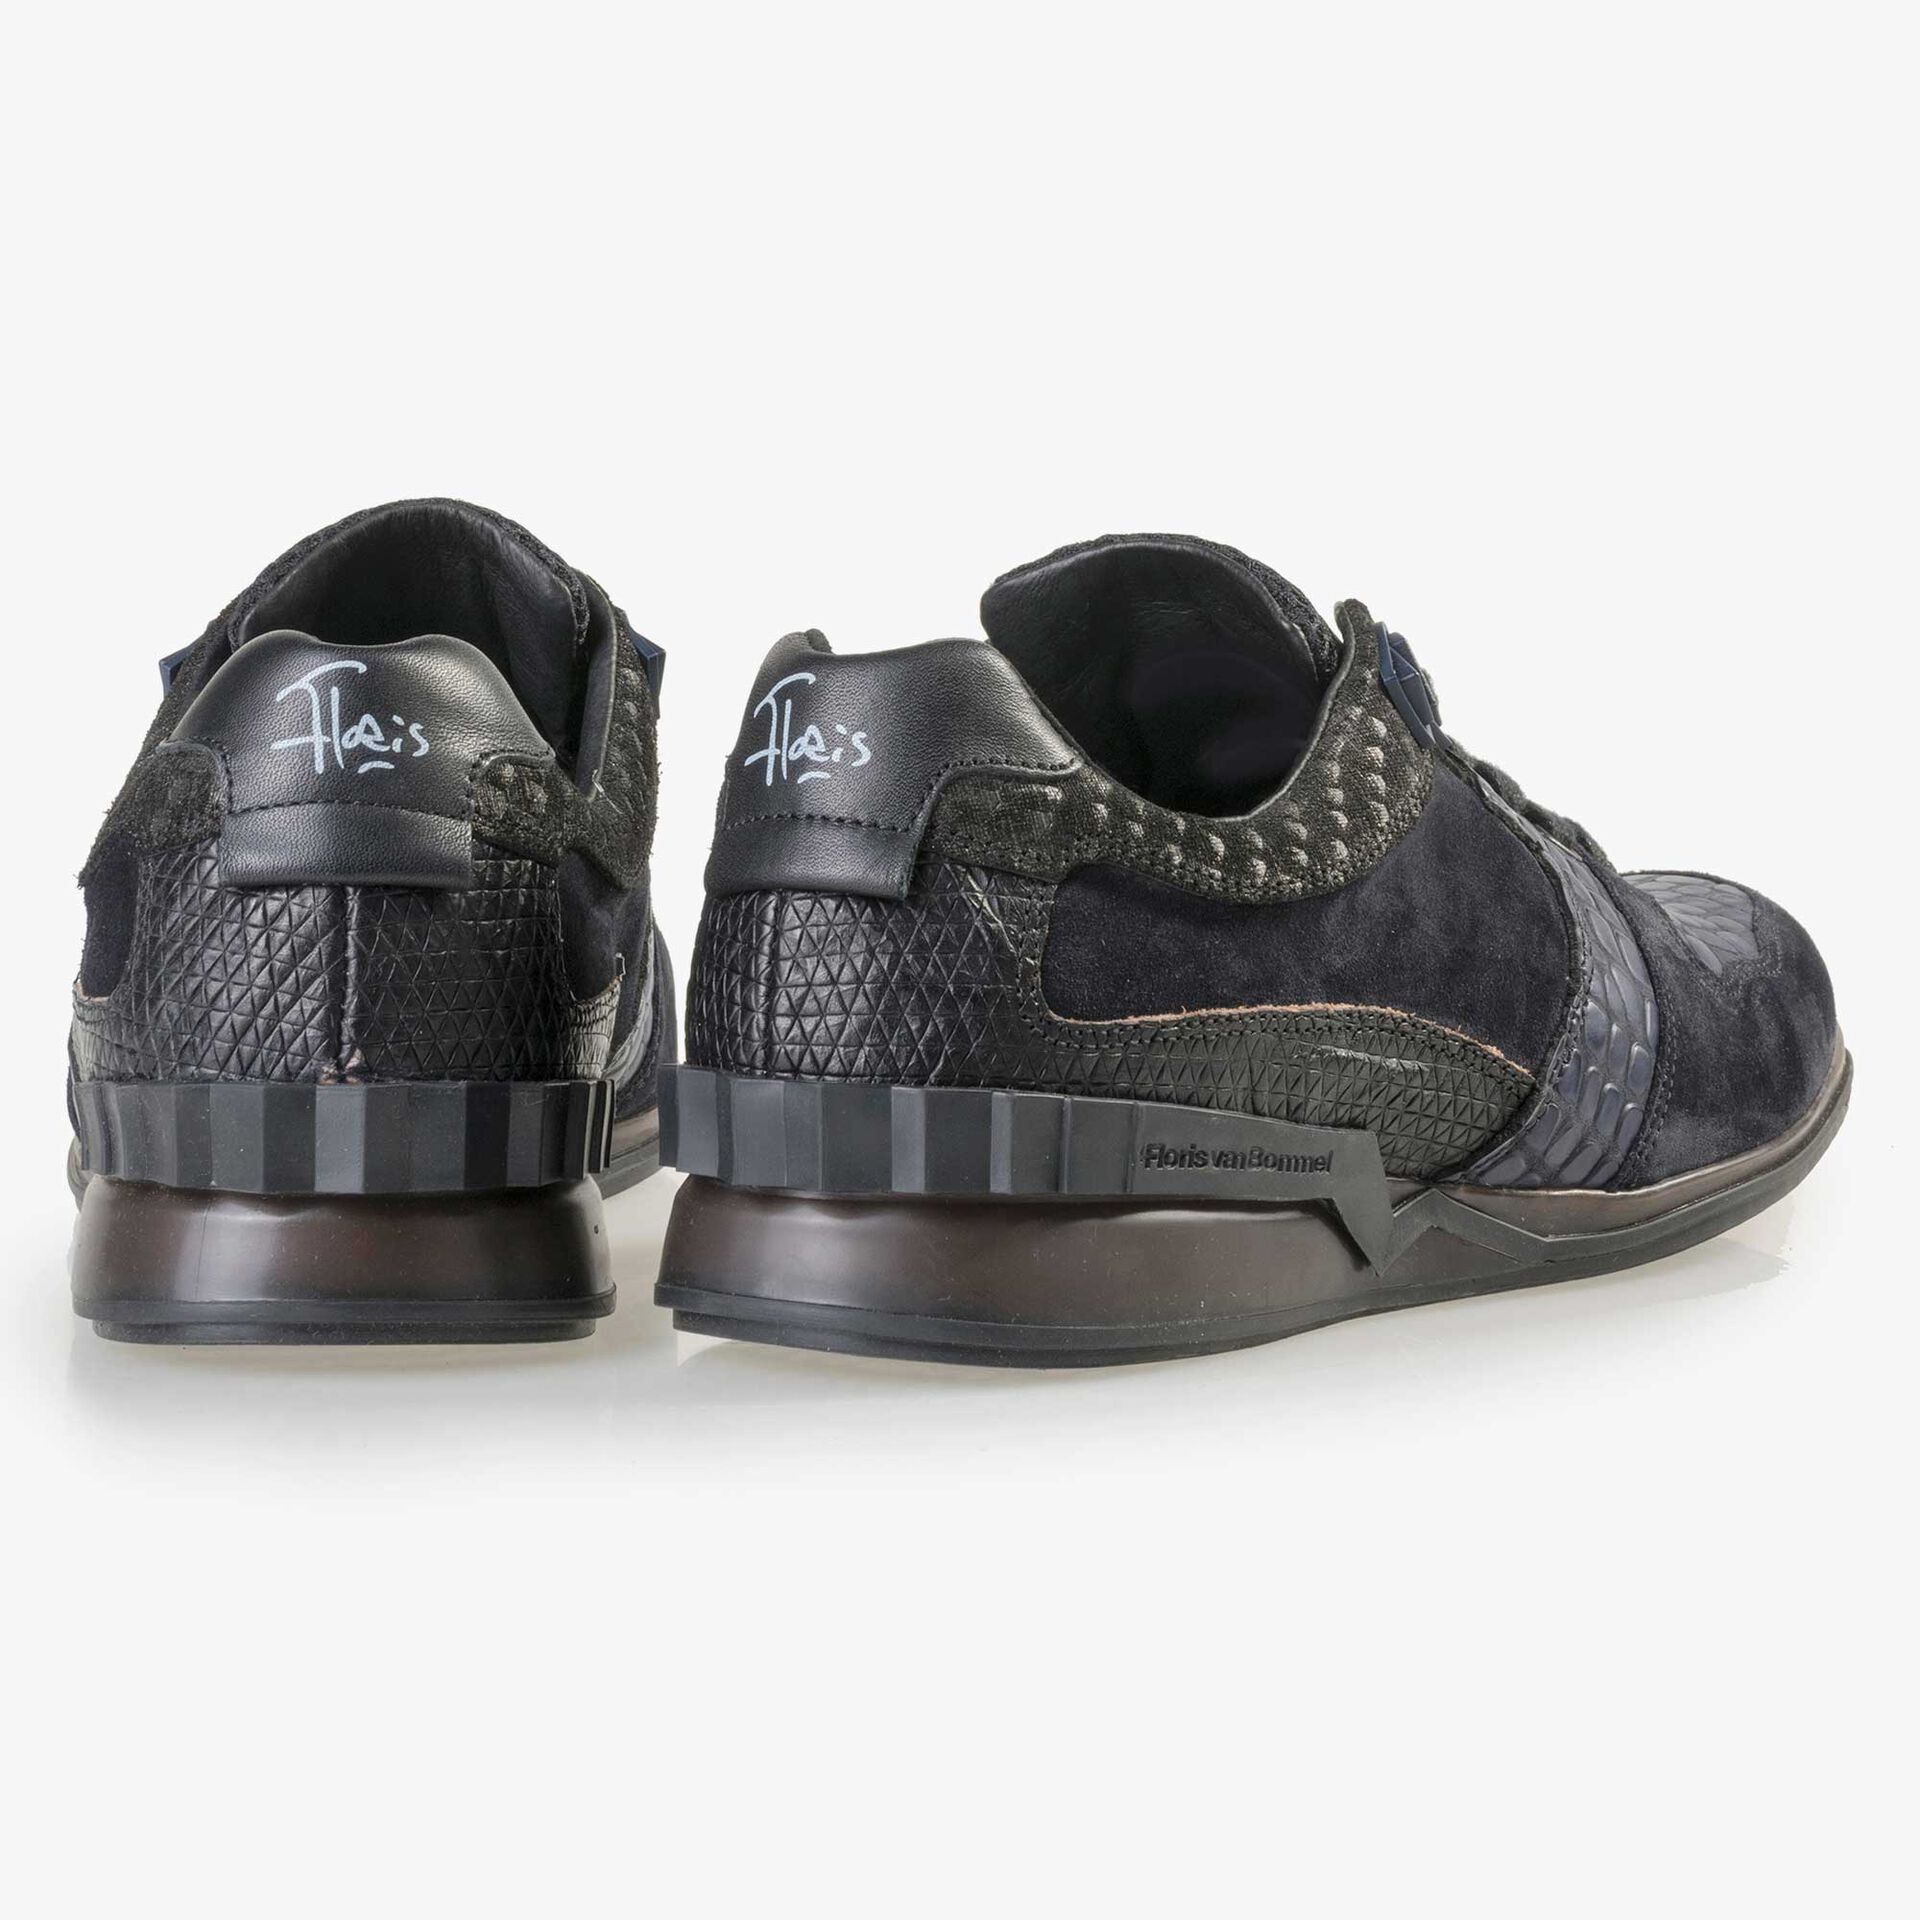 Floris van Bommel Premium donkerblauwe leren sneaker